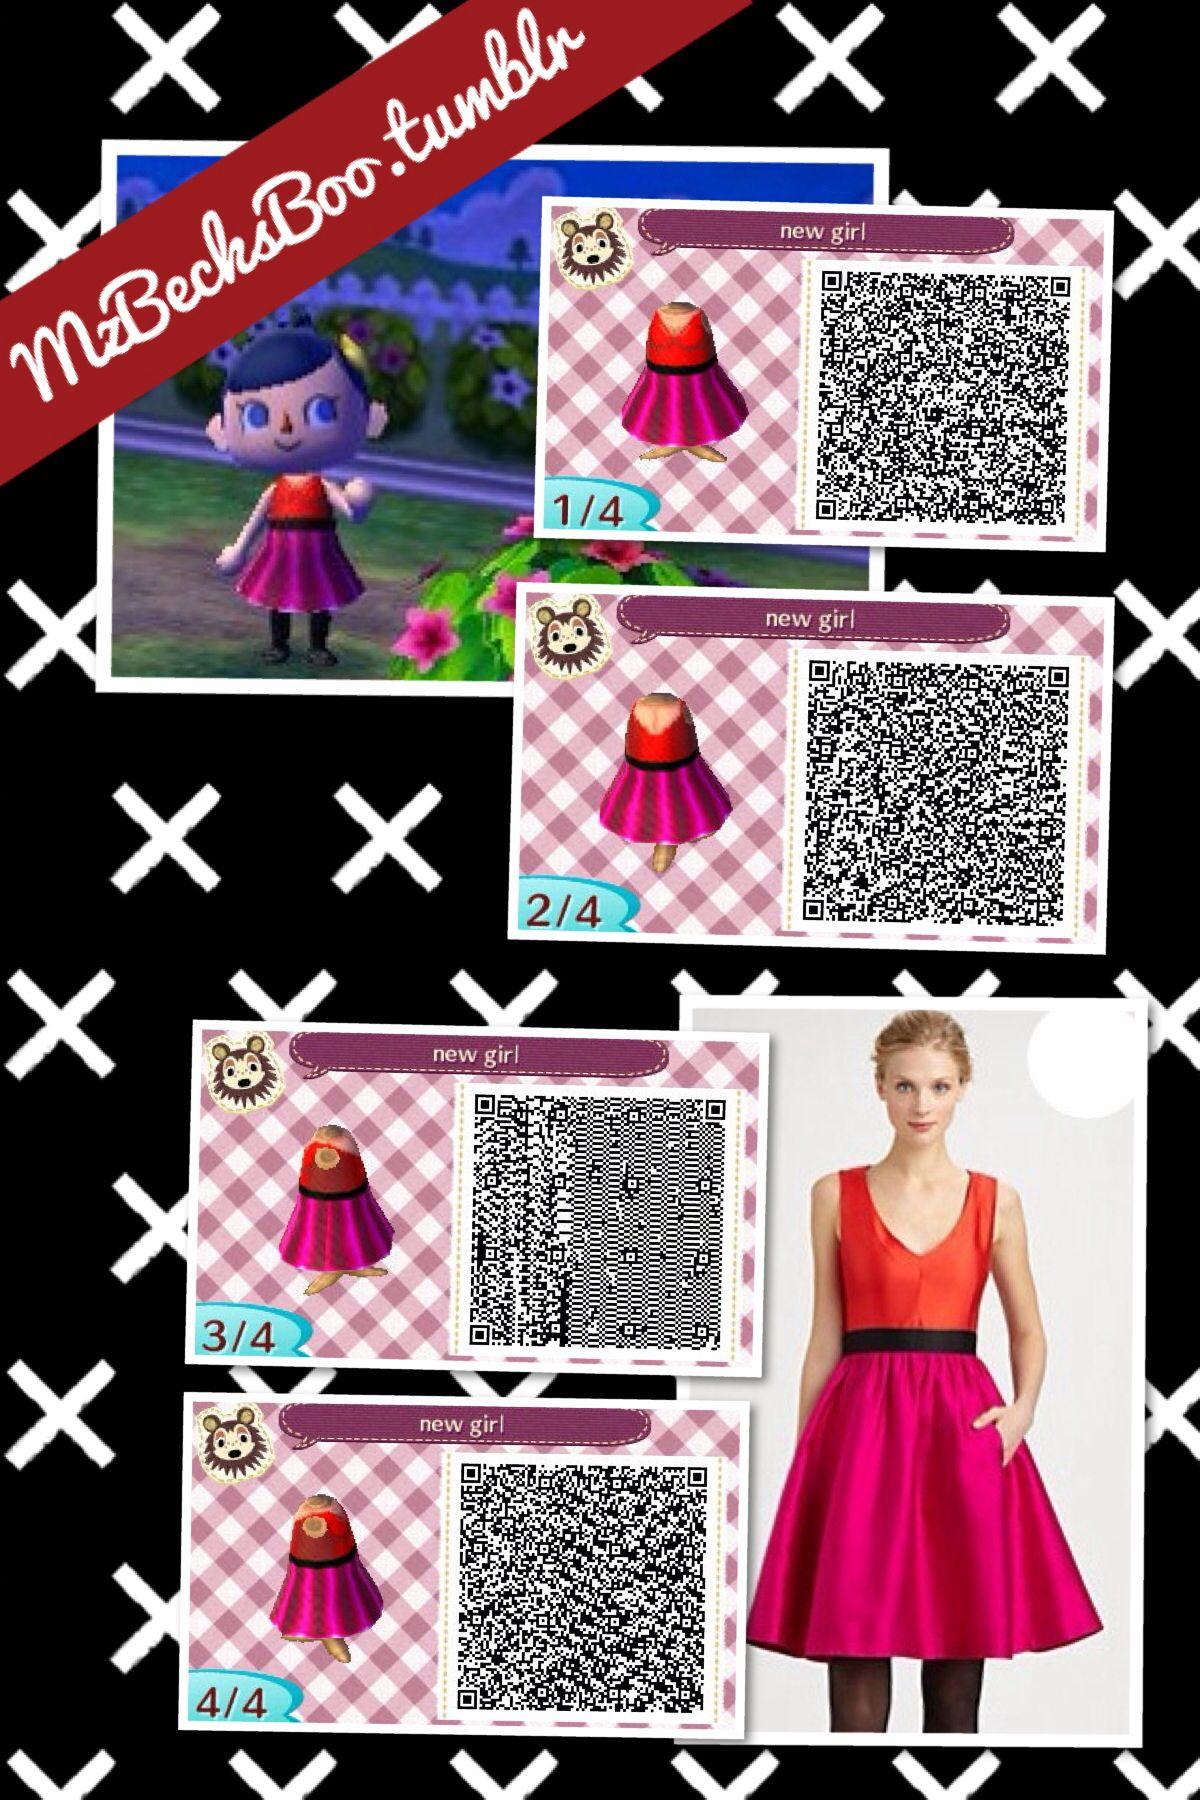 Mzbecksboo Tumblr Com Animal Crossing Qr Codes Animal